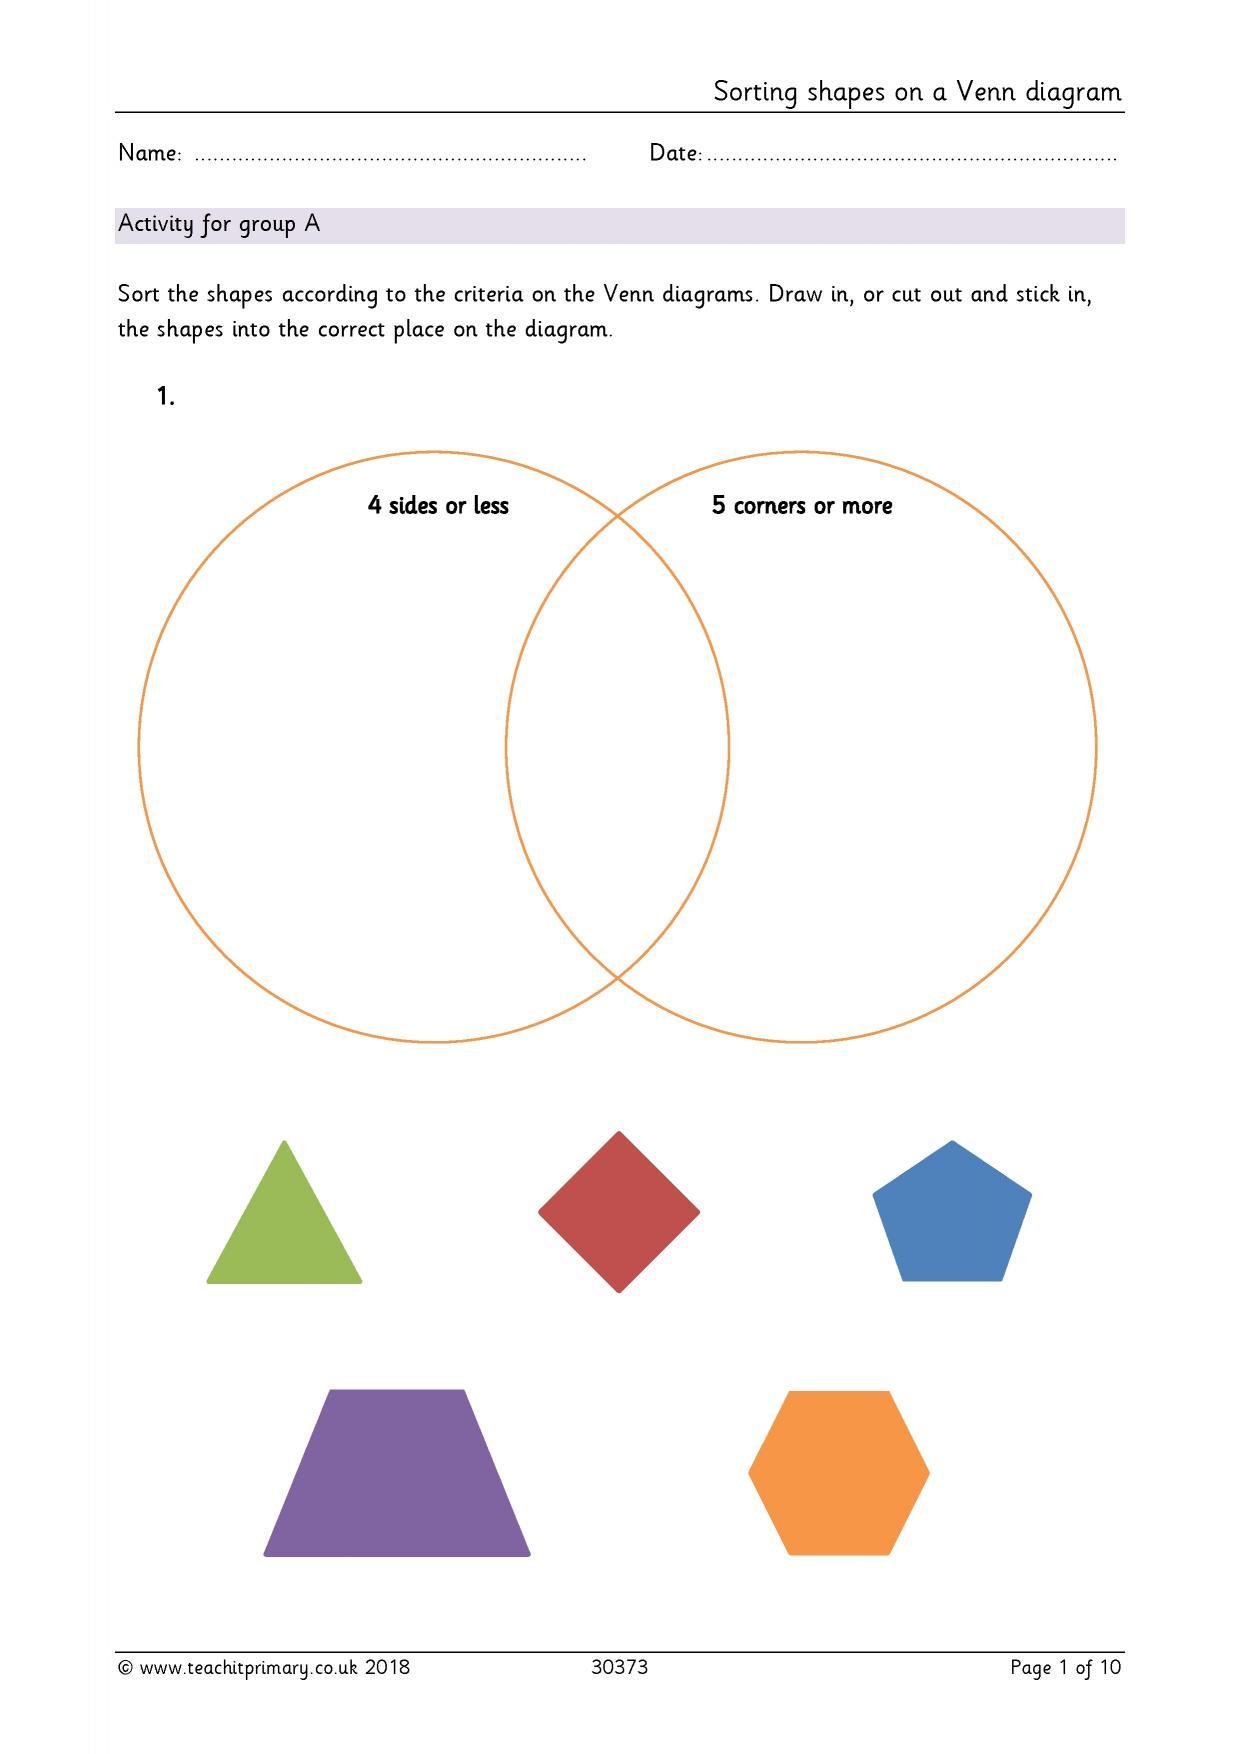 Venn diagram shape sorting venn diagram shape sorting ks1 wiring sorting shapes on a venn diagram venn diagram shape sorting game venn diagram shape sorting ccuart Choice Image